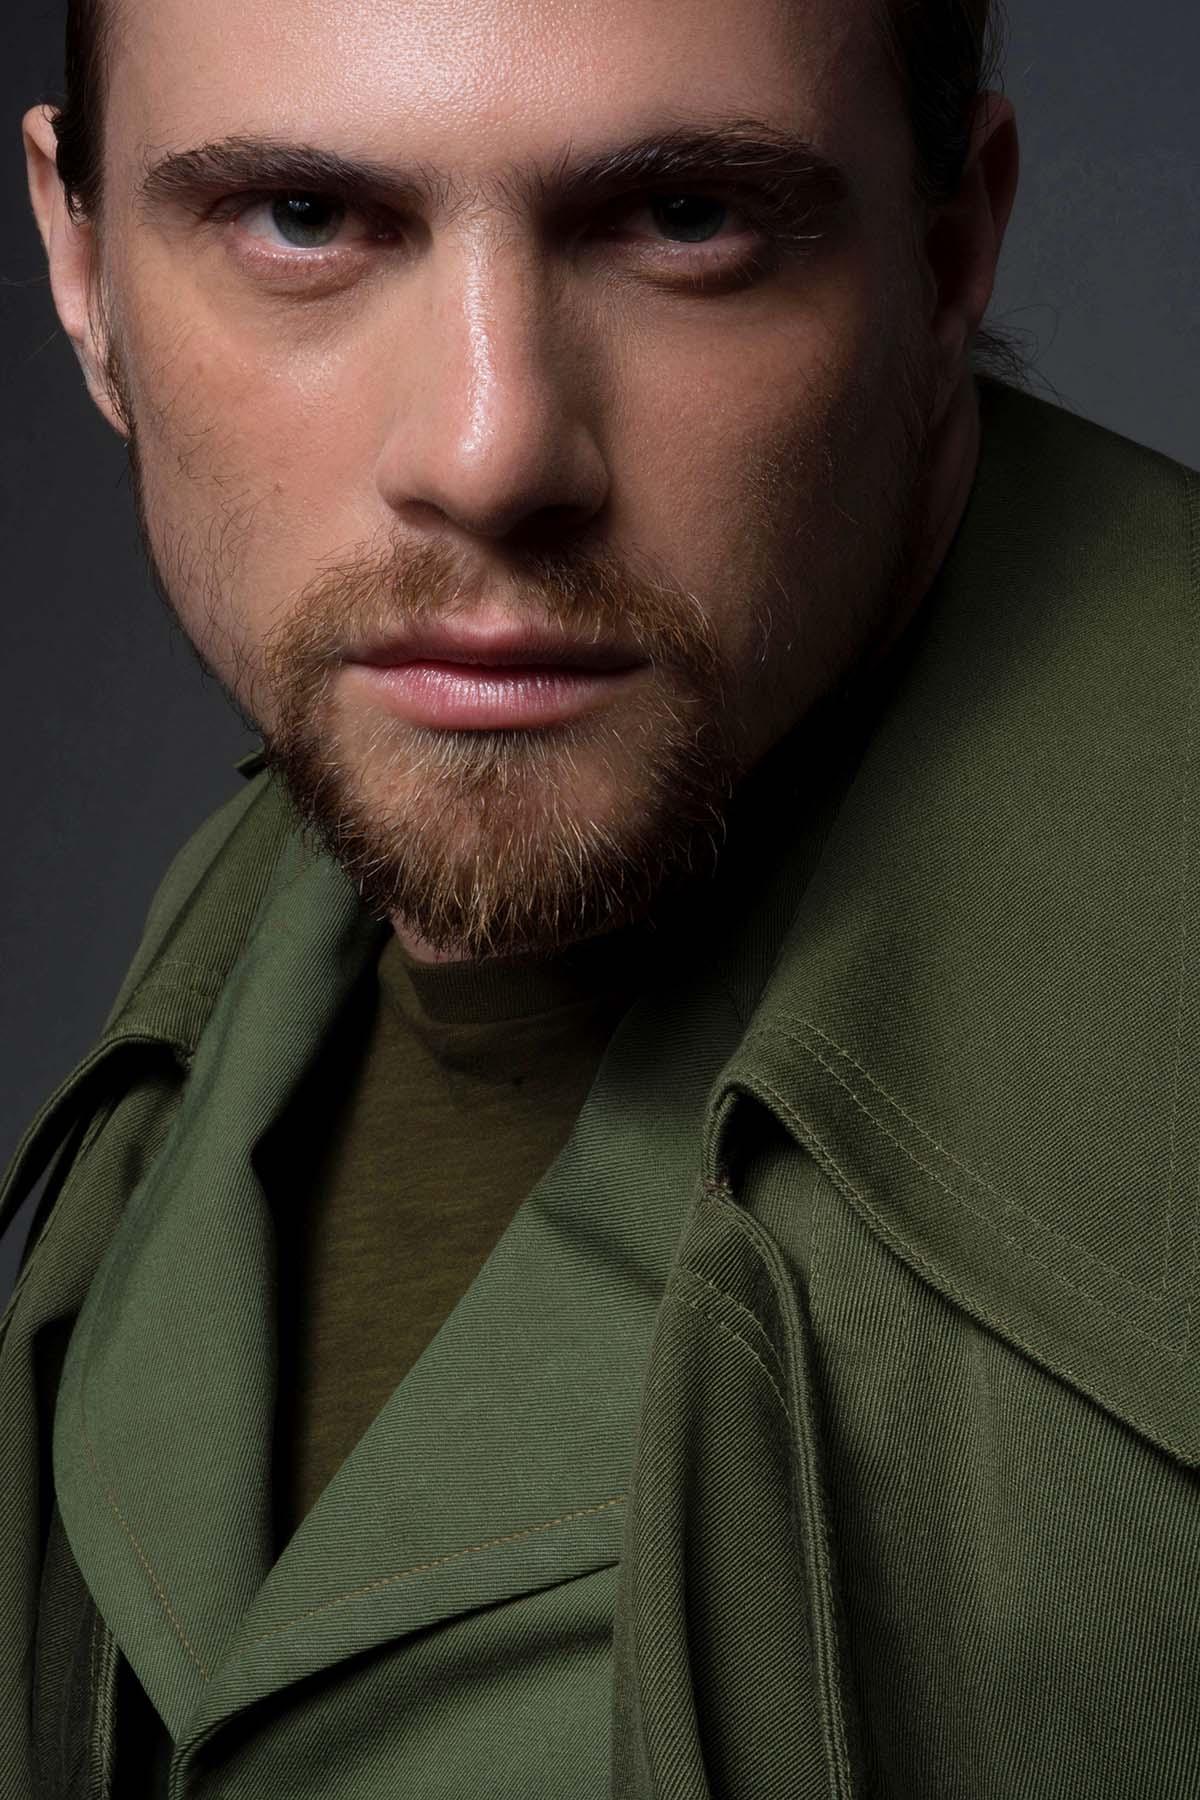 Ed Marquezini by De Macedo for Brazilian Male Model